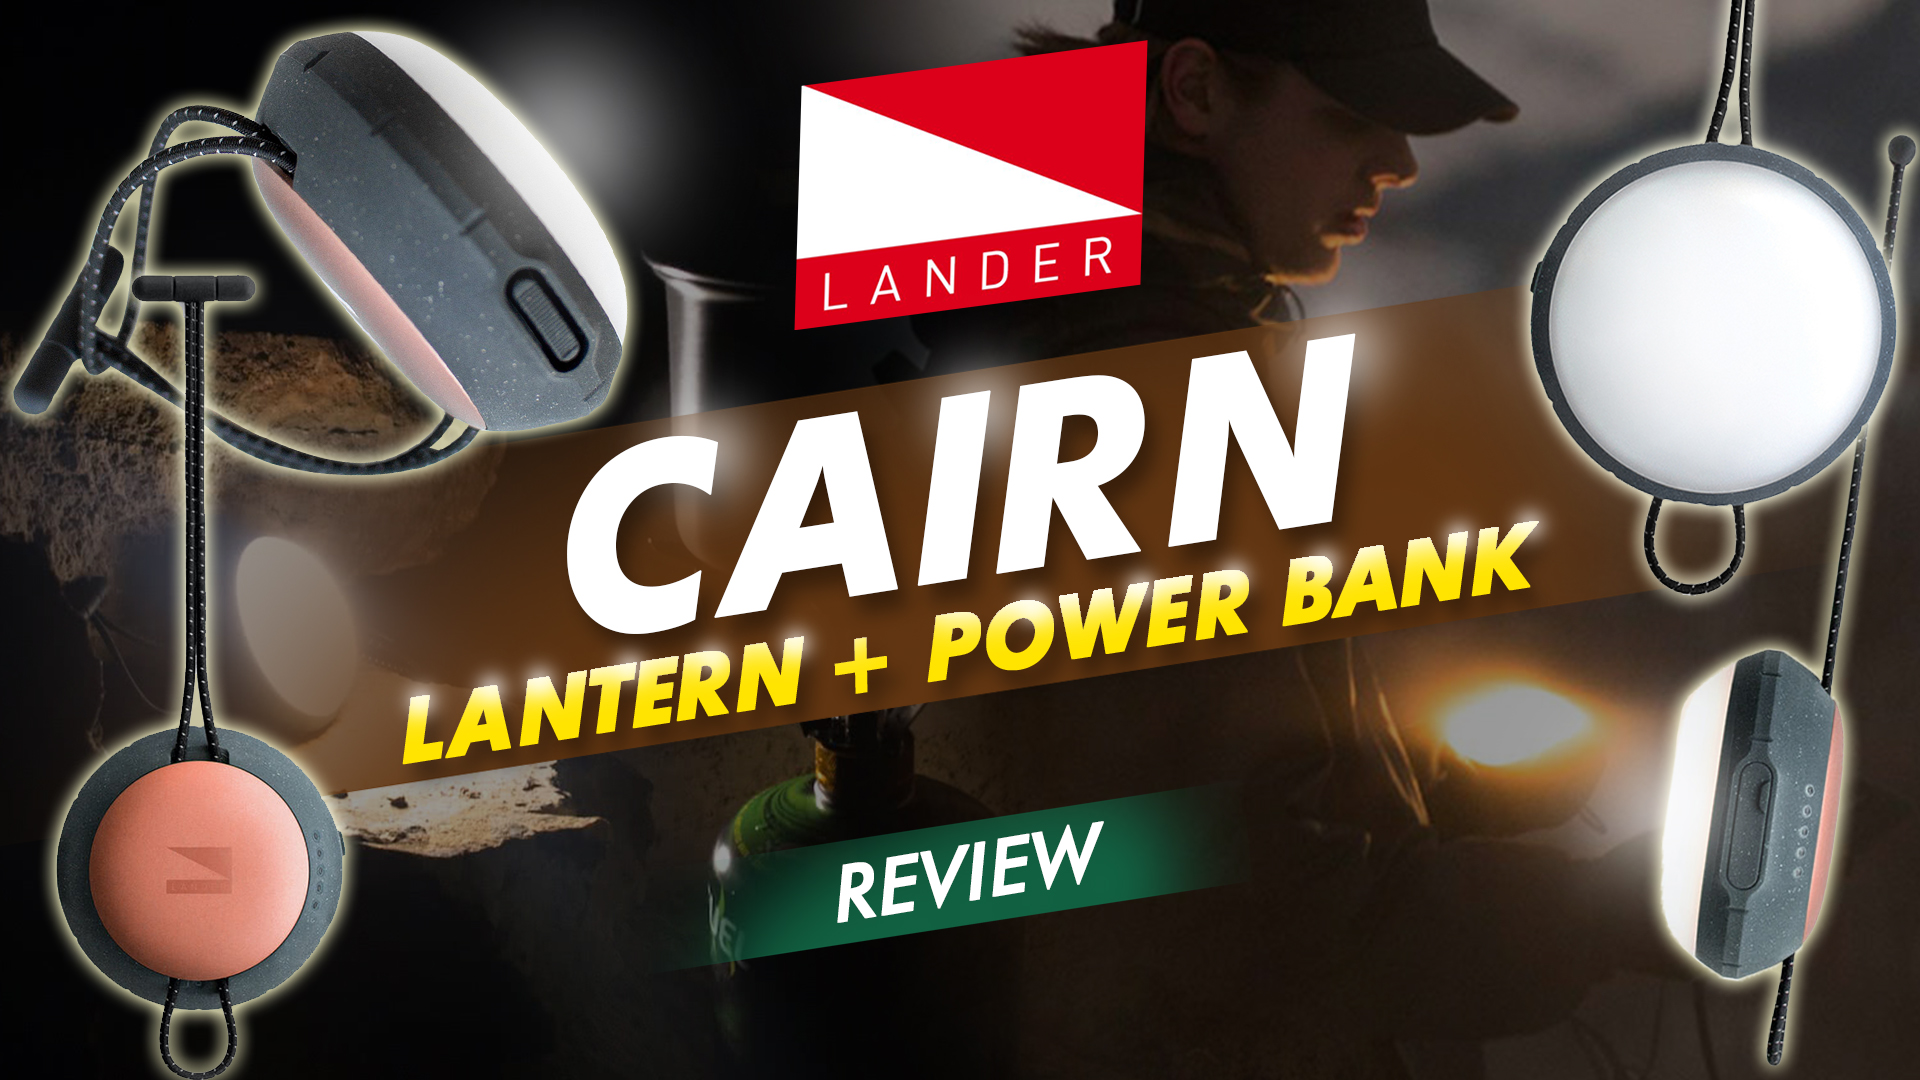 Cairn Lantern + Power Bank Review